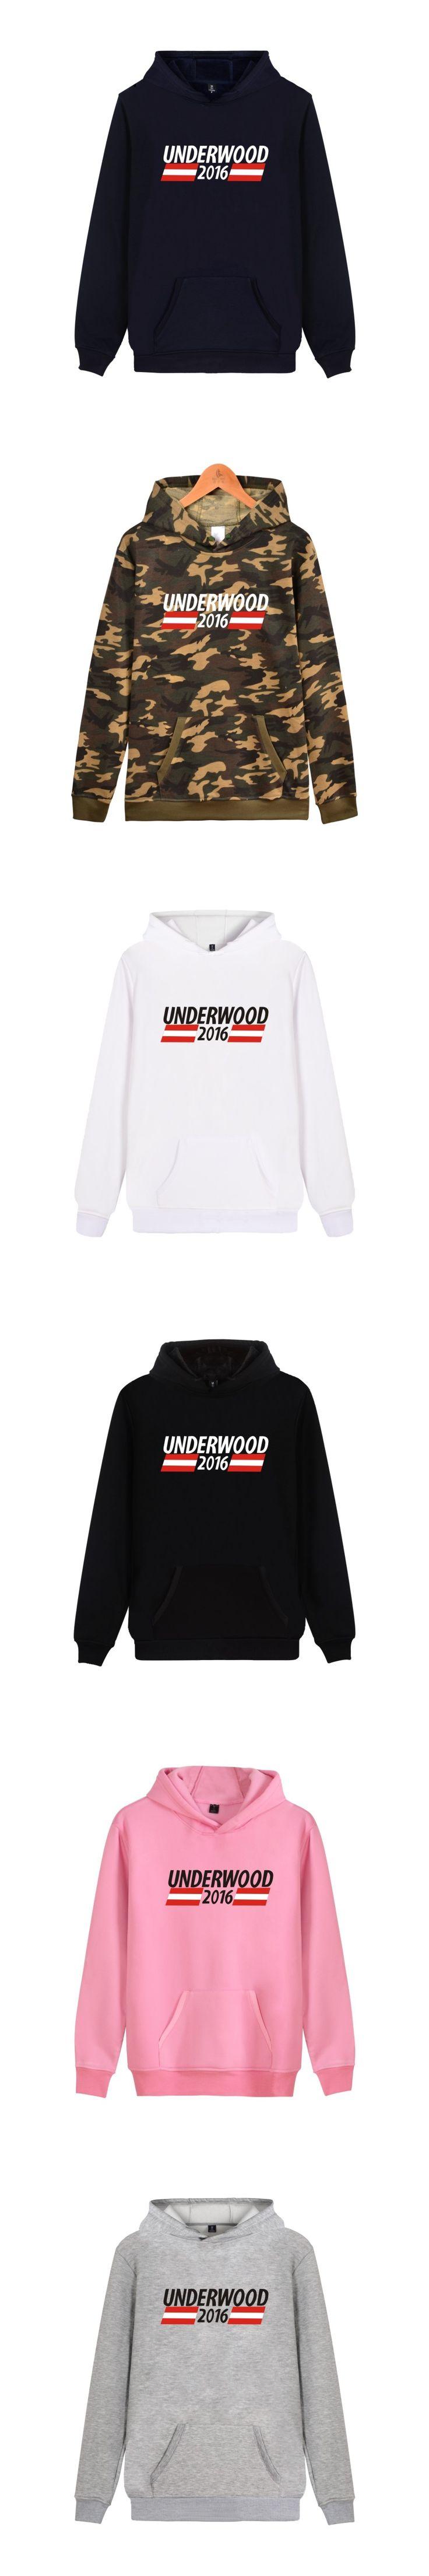 Wangcangli 2016 House Of Cards Casual  Heavy Metals Hoodies Fashion Men Cap Hooded Sweatshit Leisure Clothes Plus Size XXXXL